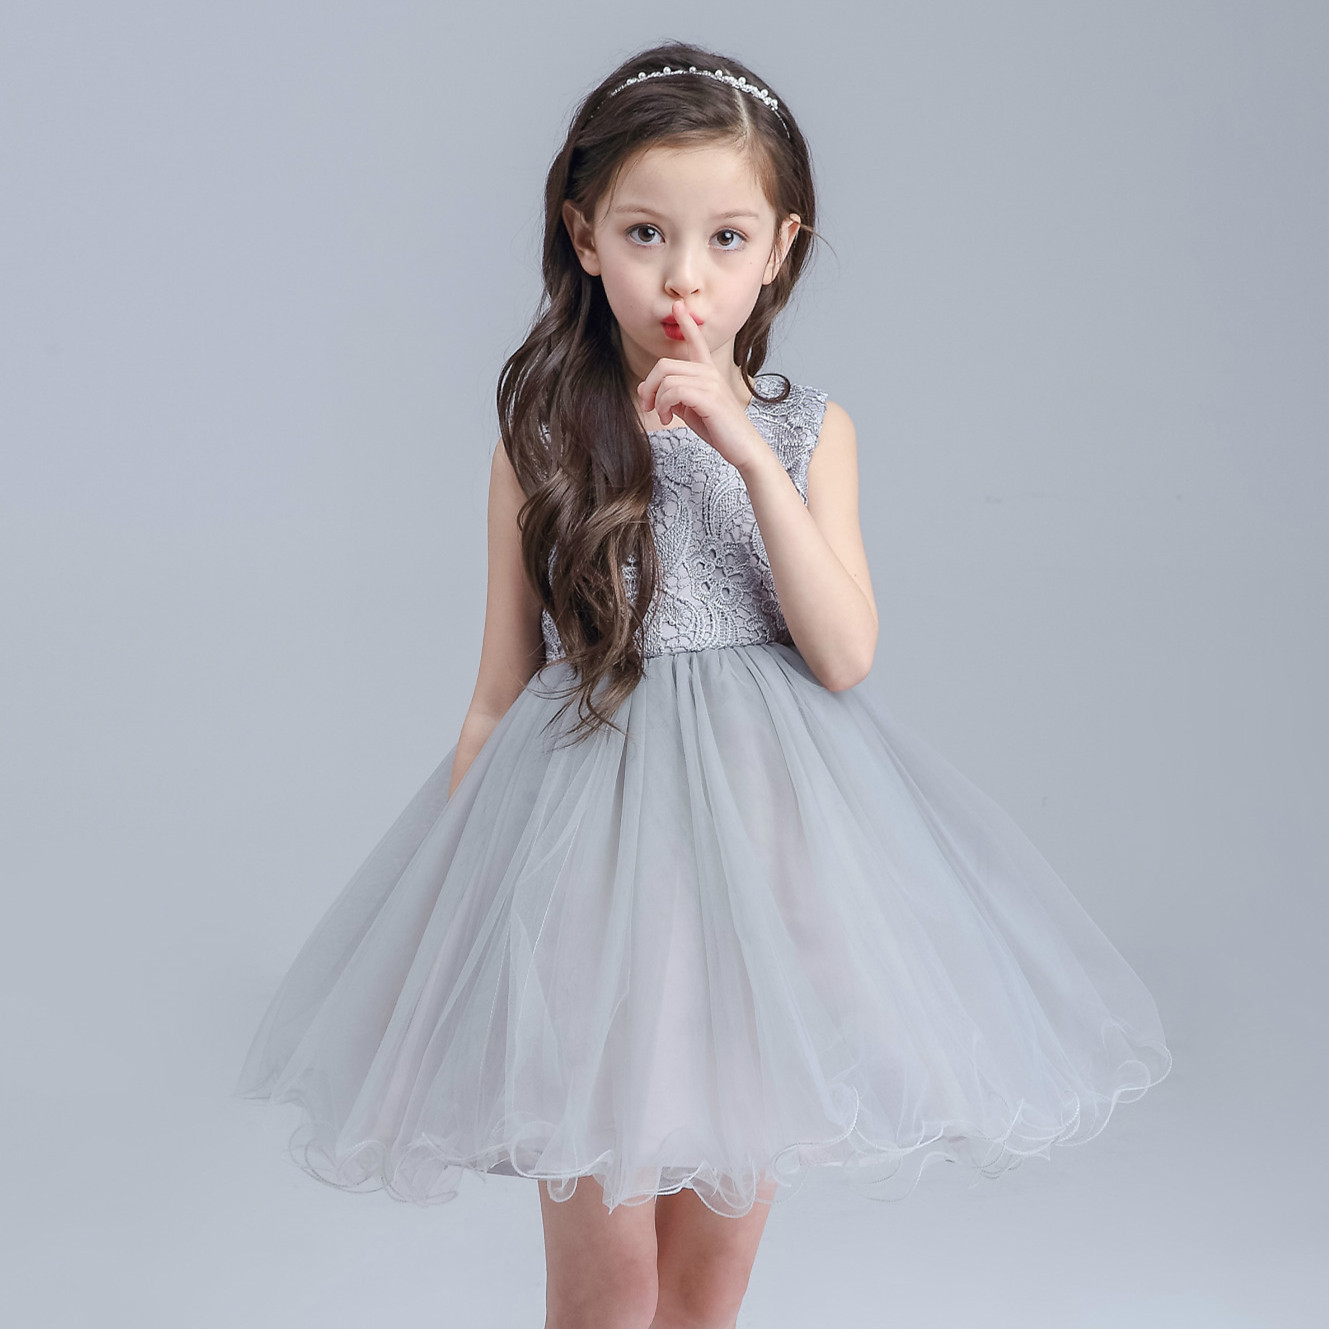 Dorable Kid Party Dresses Model - All Wedding Dresses ...